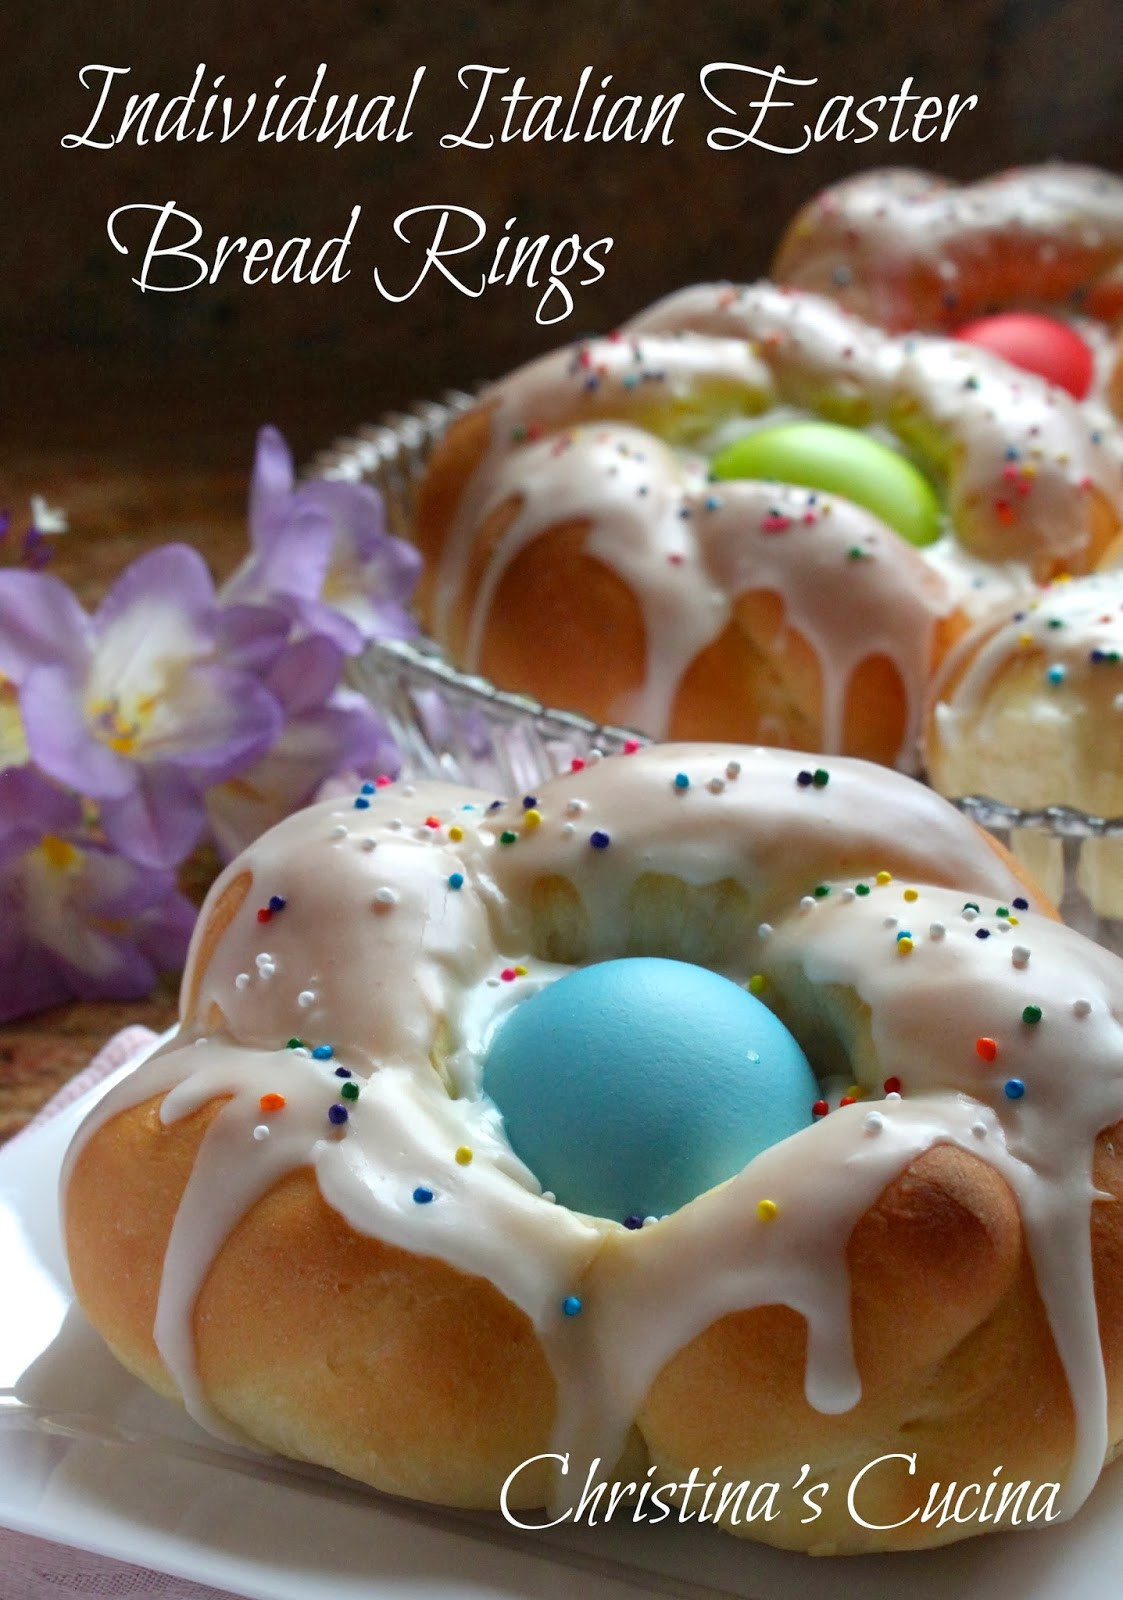 Easy Italian Easter Bread Recipe  Individual Italian Easter Bread Rings…Easy Step by Step